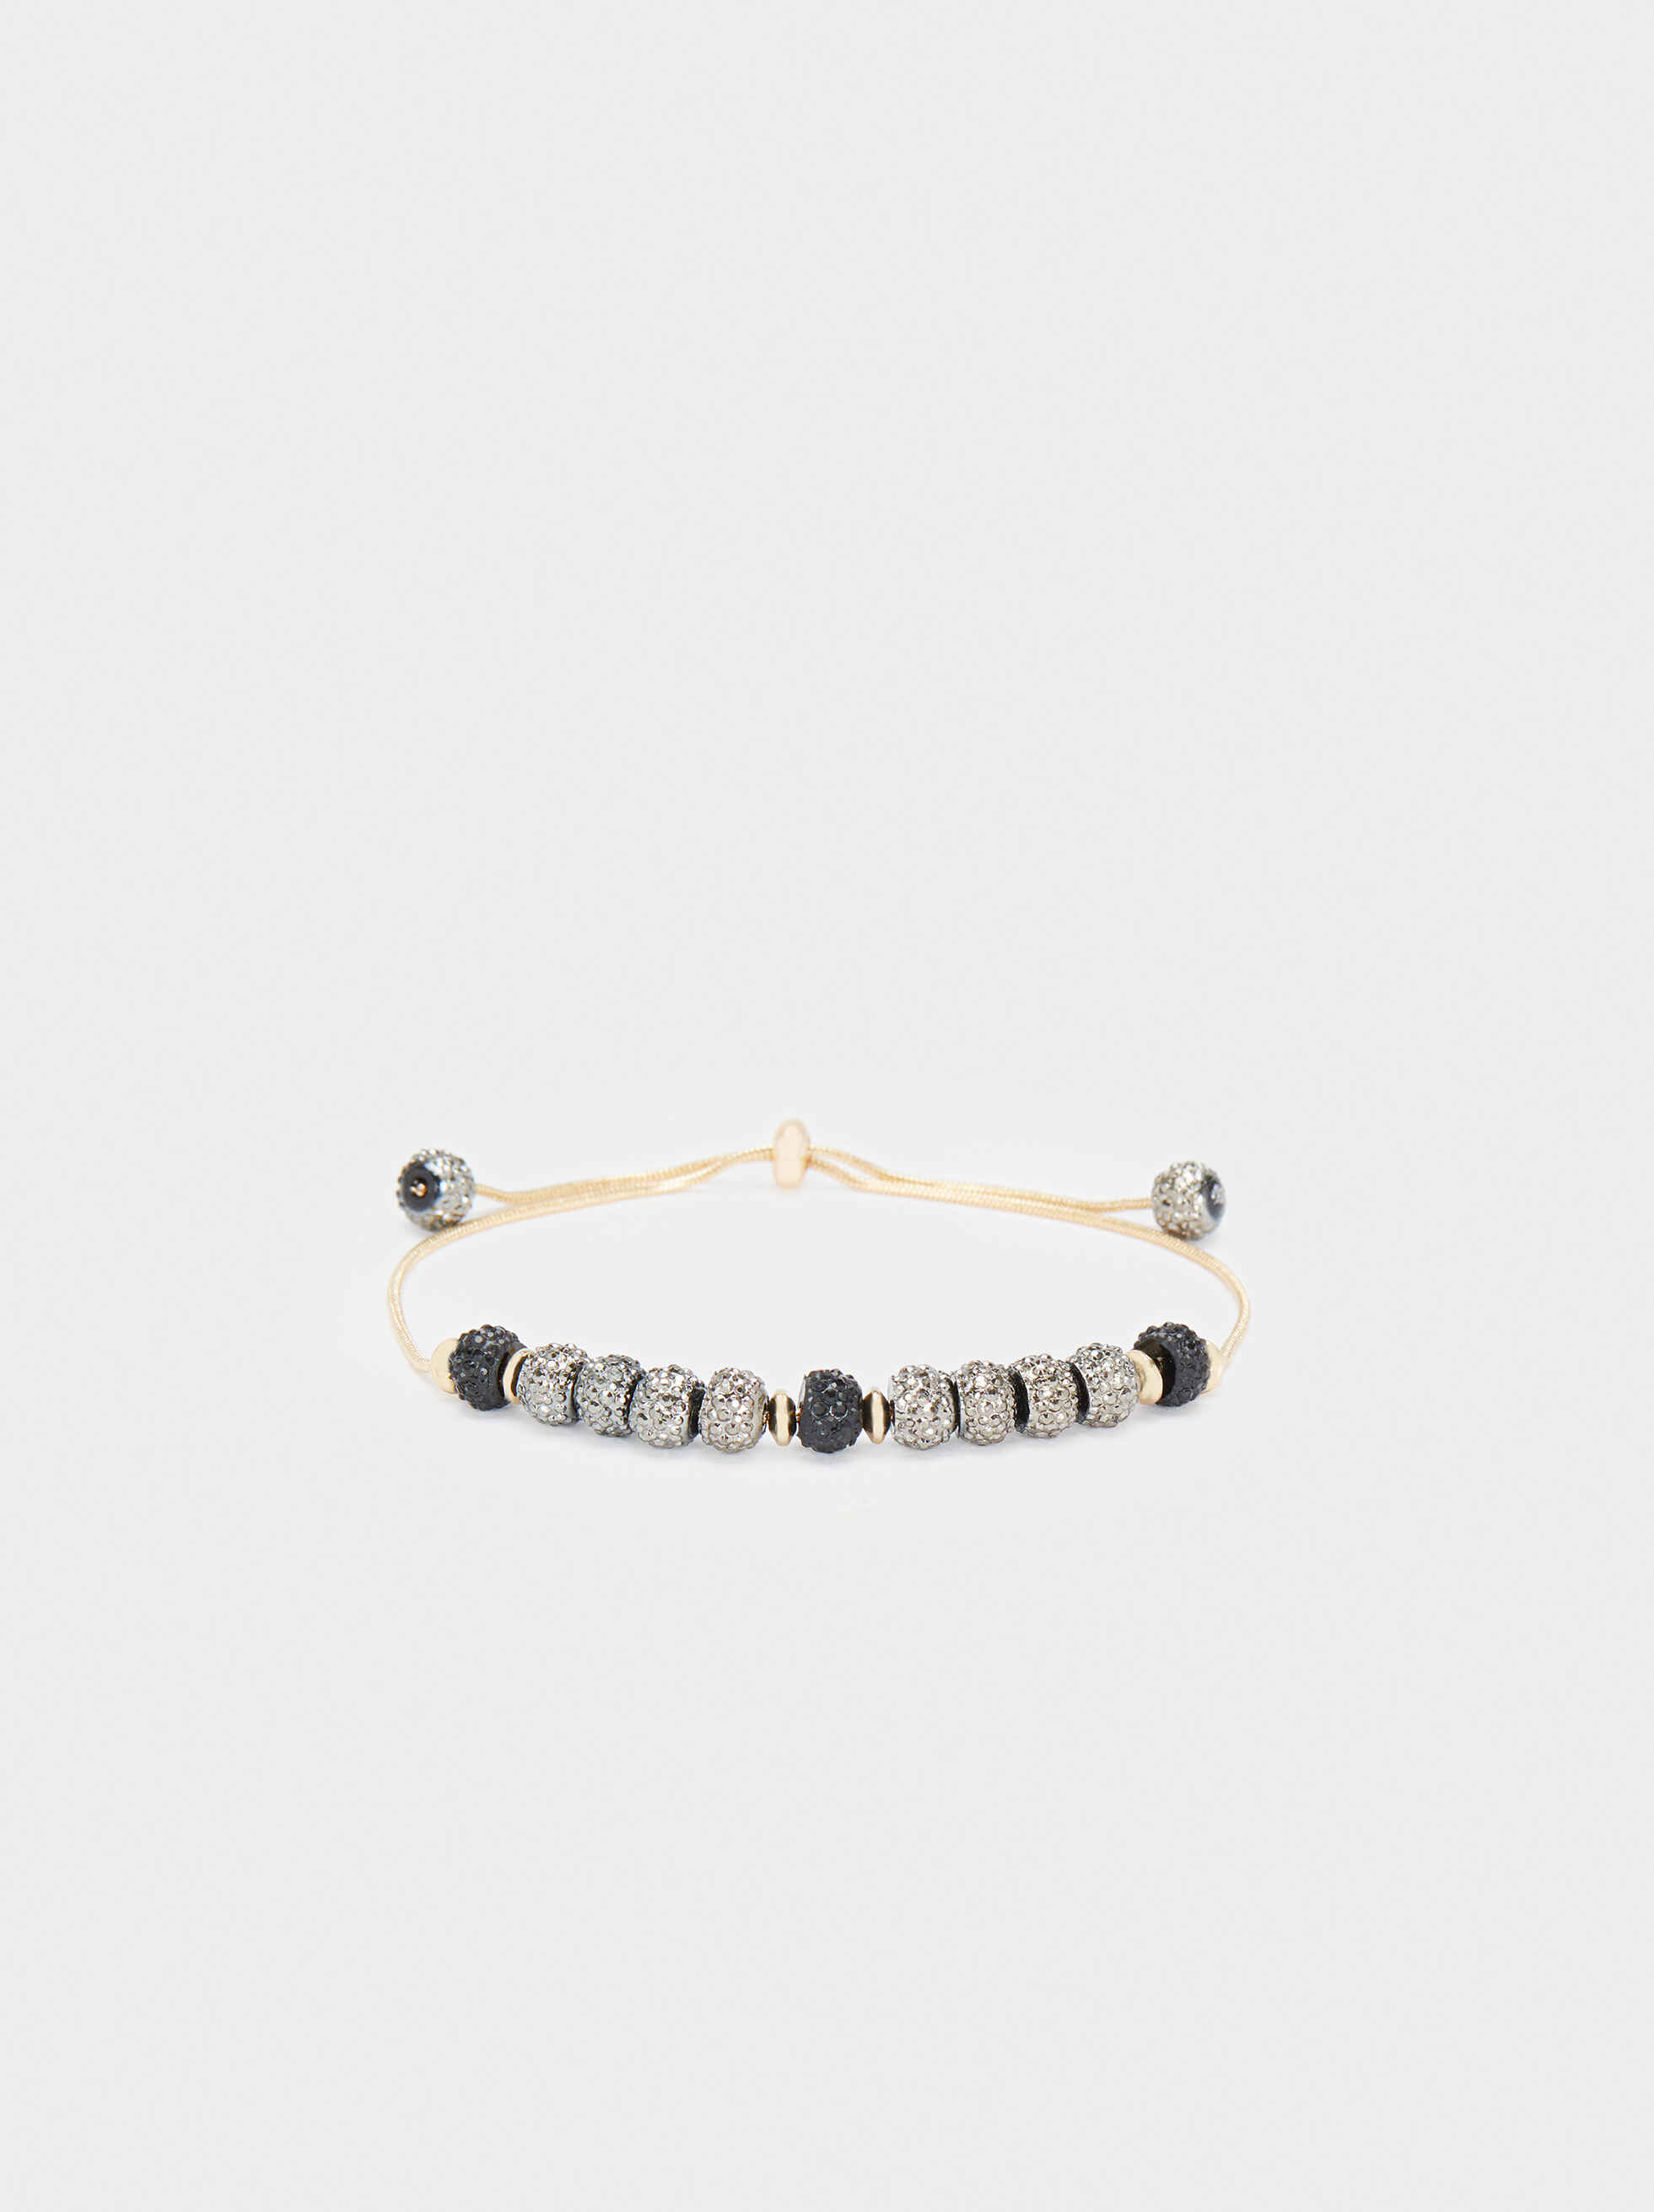 Adjustable Bracelet With Beads, Multicolor, hi-res